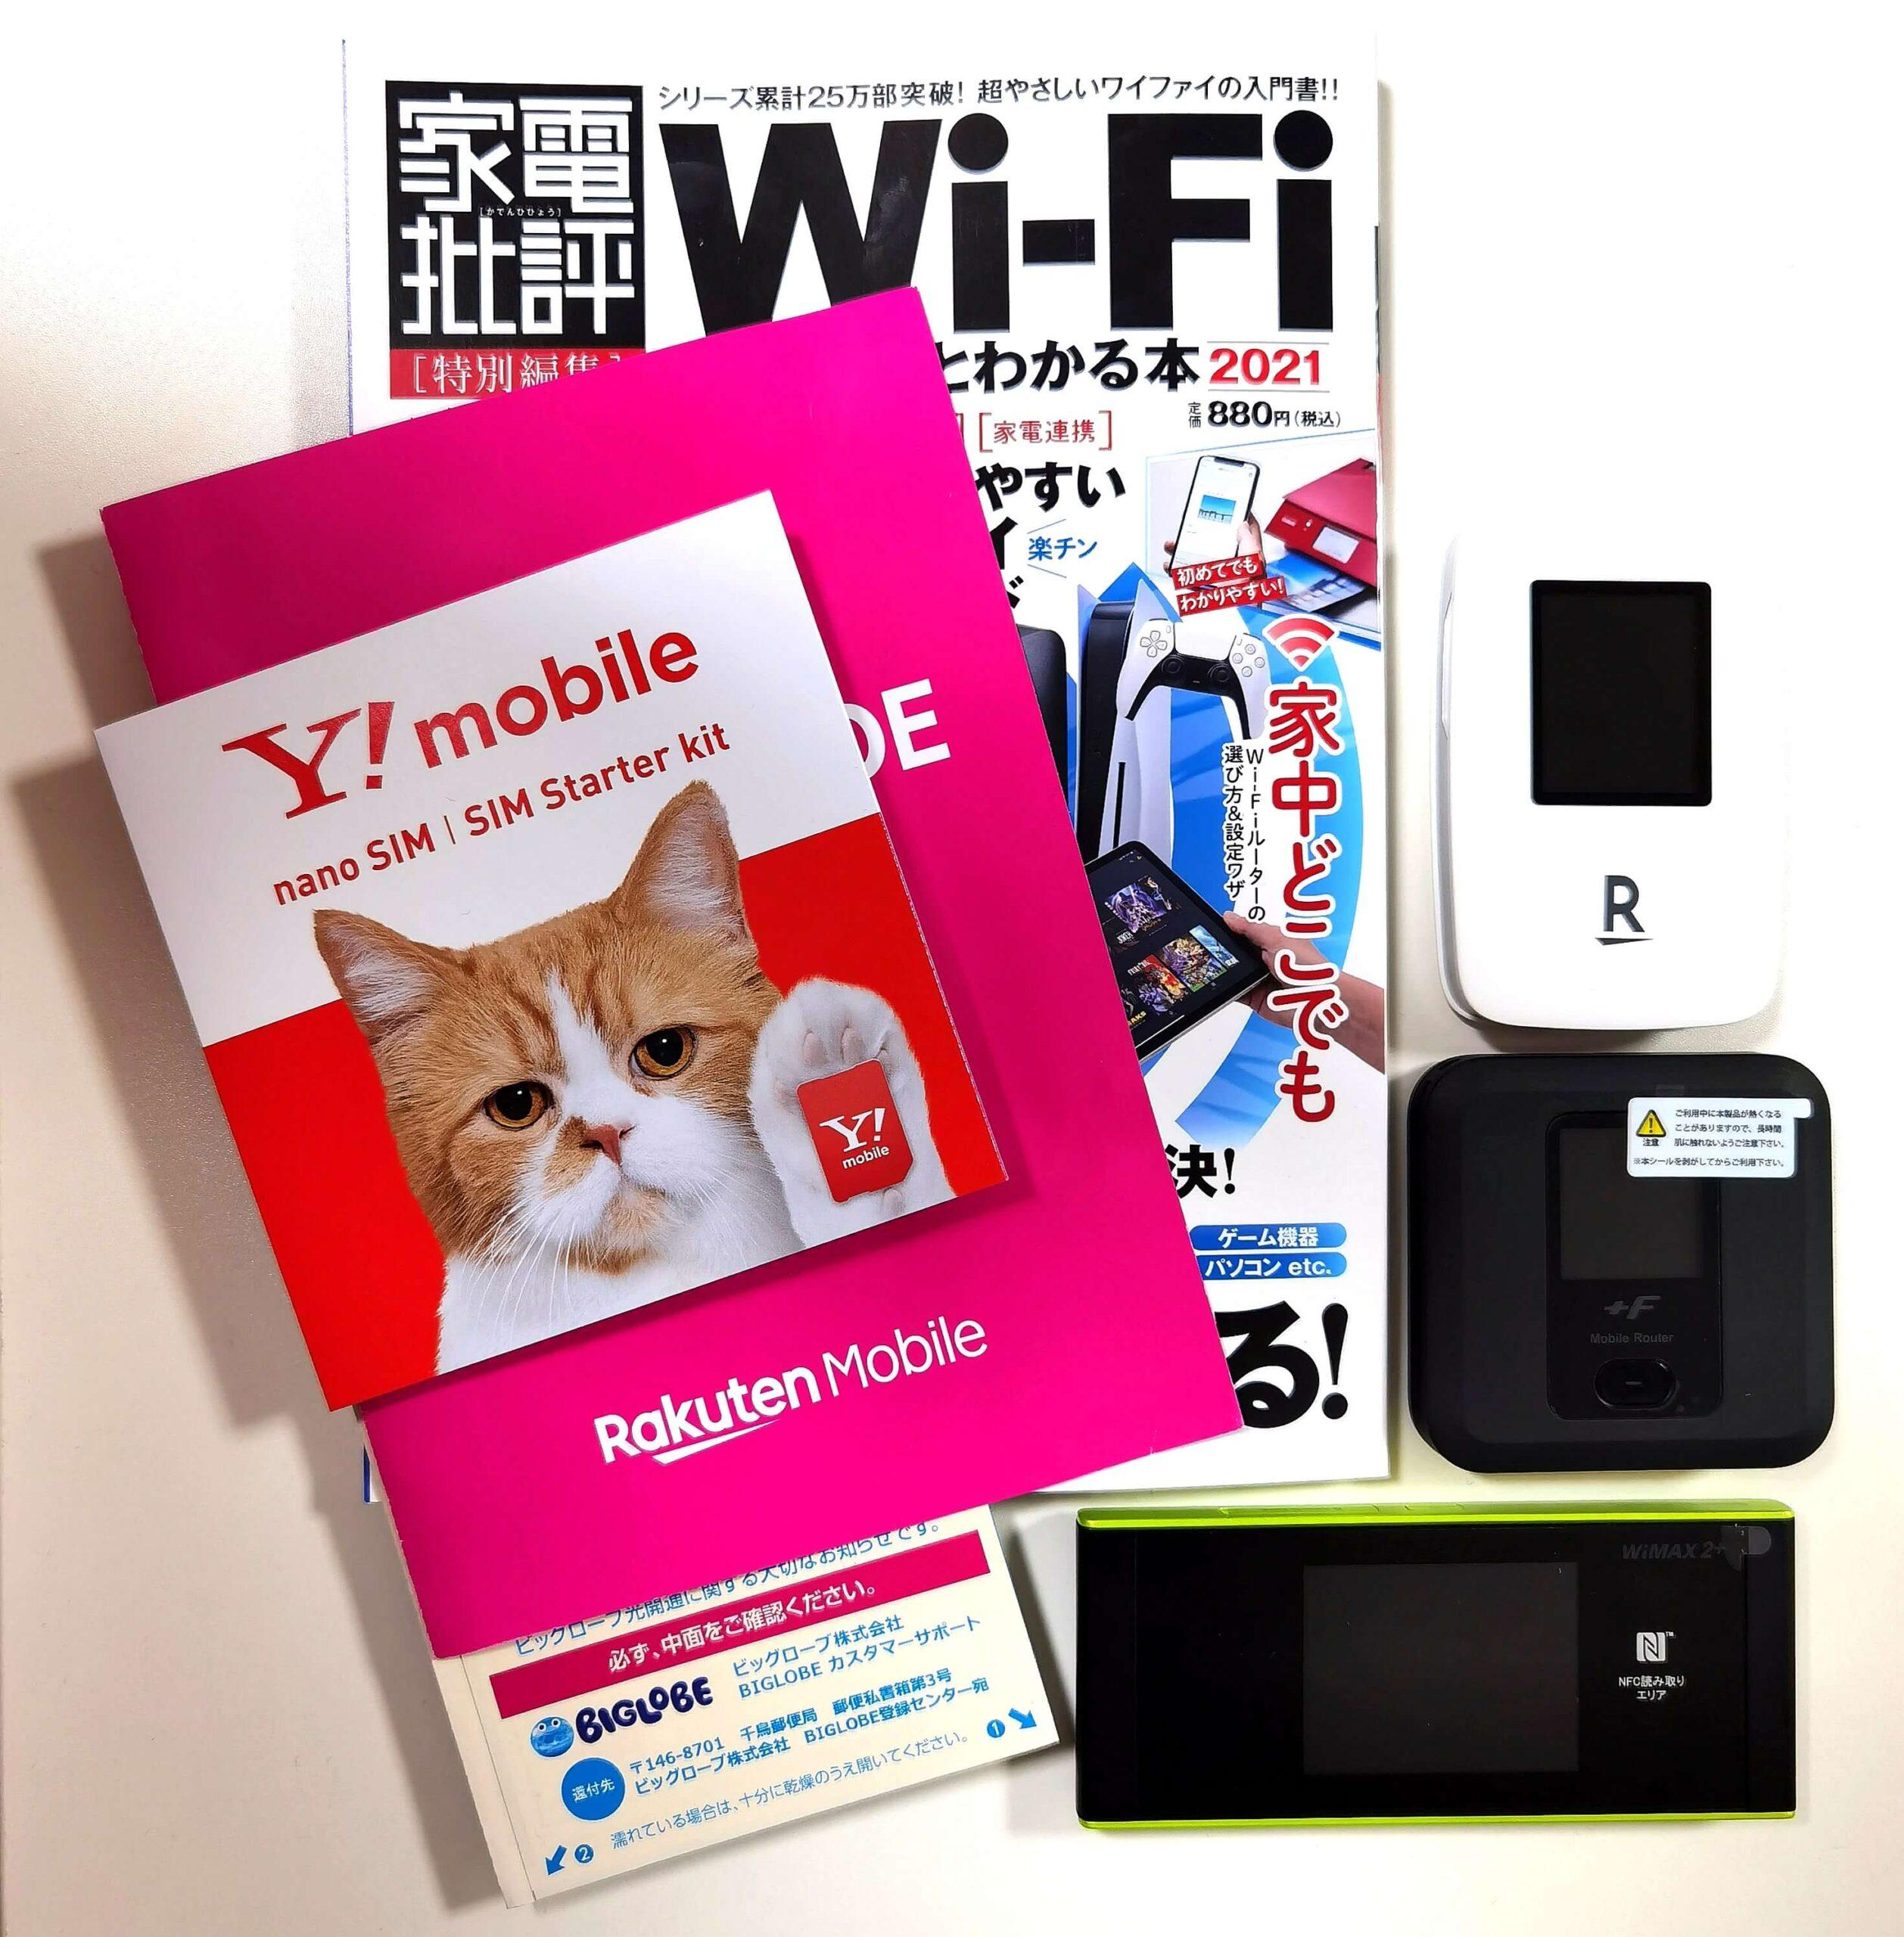 WiMAXやモバイルWi-Fiの本体、書籍